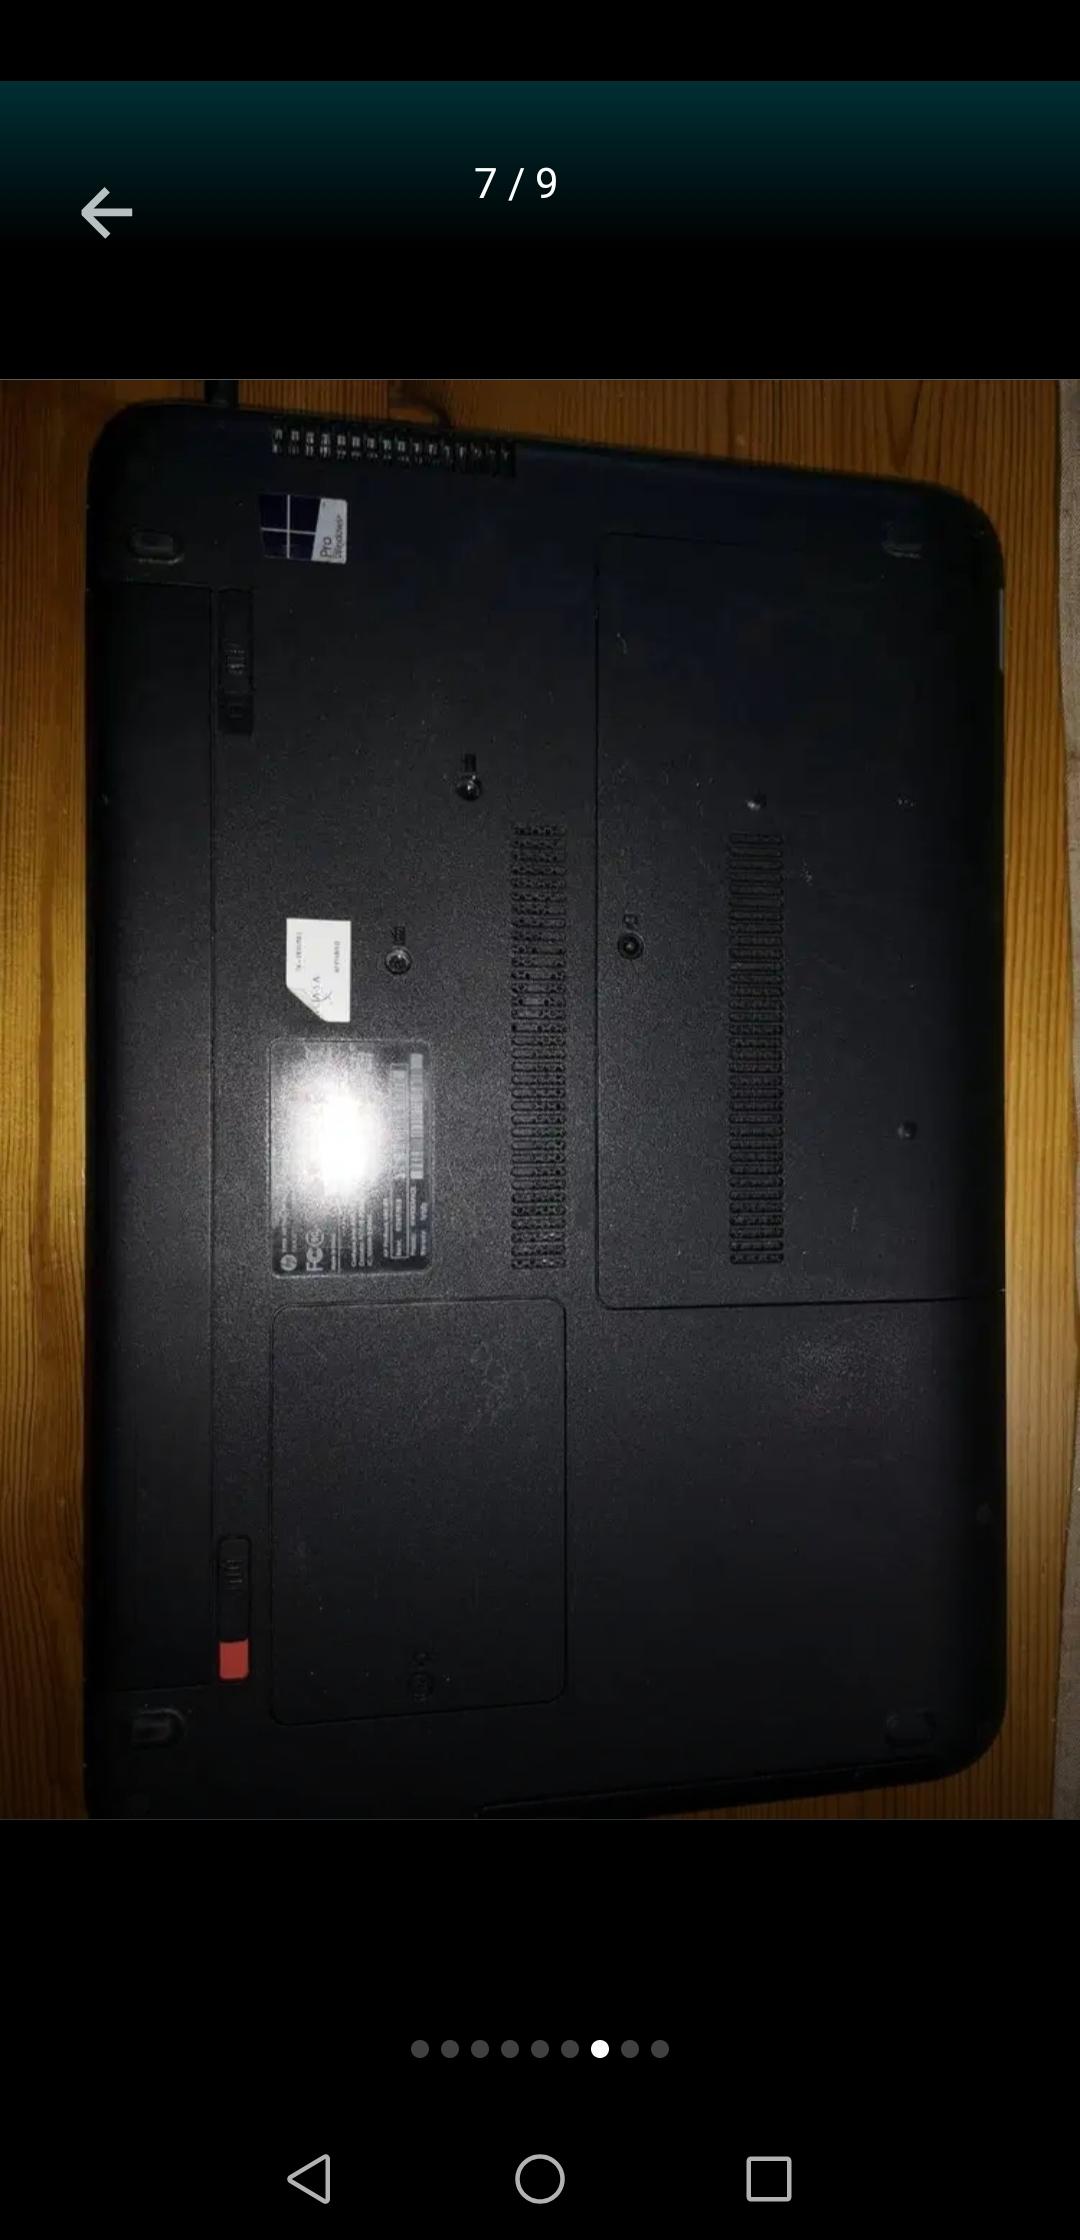 HP Probook 450 G3 for sale.